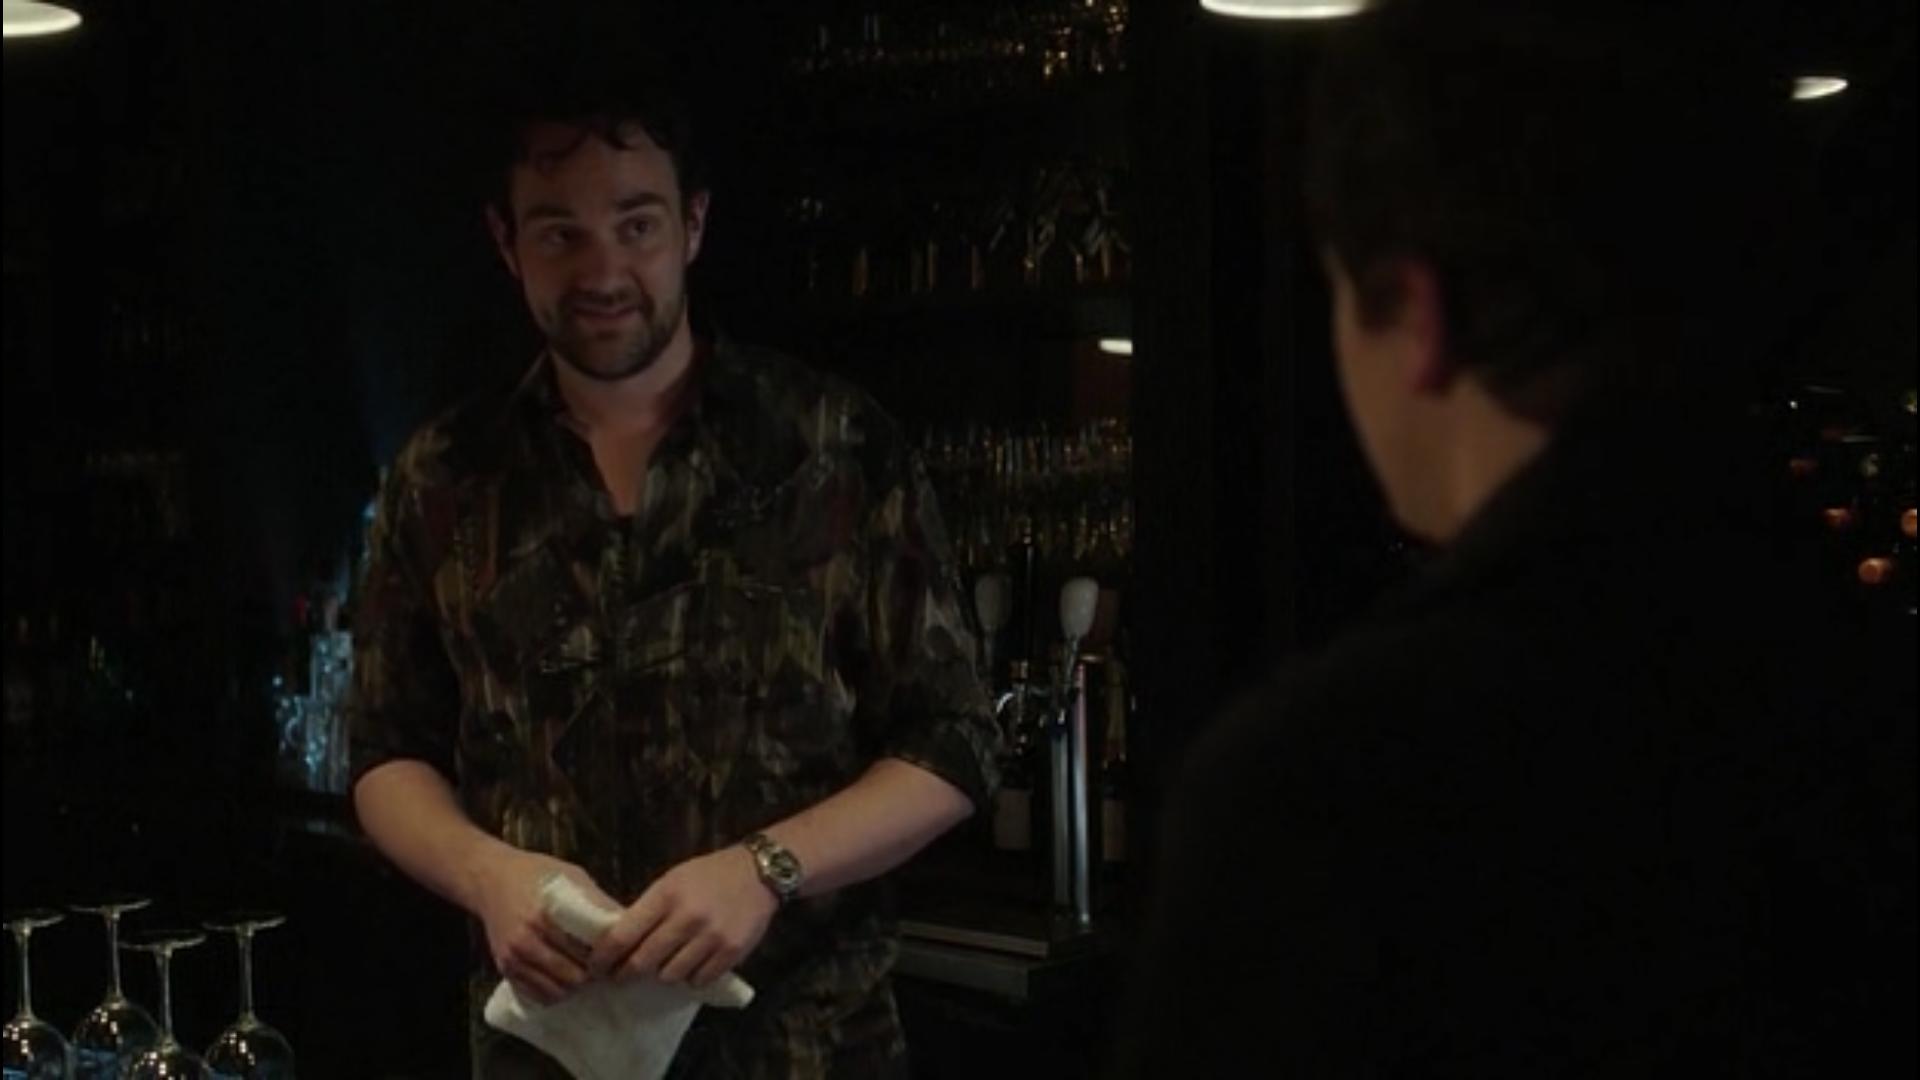 Bates Motel S05E05 - Bartender